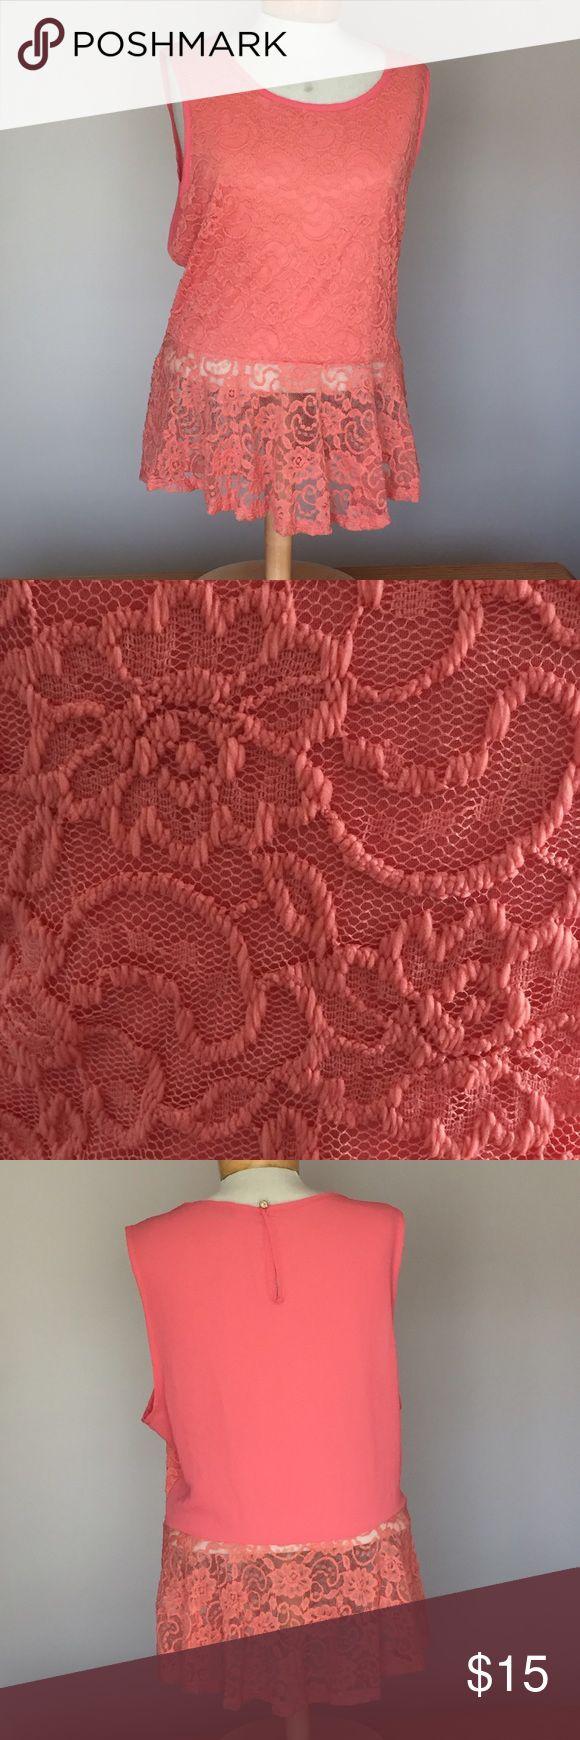 "🆕 Deb Shops Peach Lace top. Size XXL 🆕 Deb /Hugo coral Lace top. Size XXXL. 27"" long. Nylon/spandex. Deb Tops"